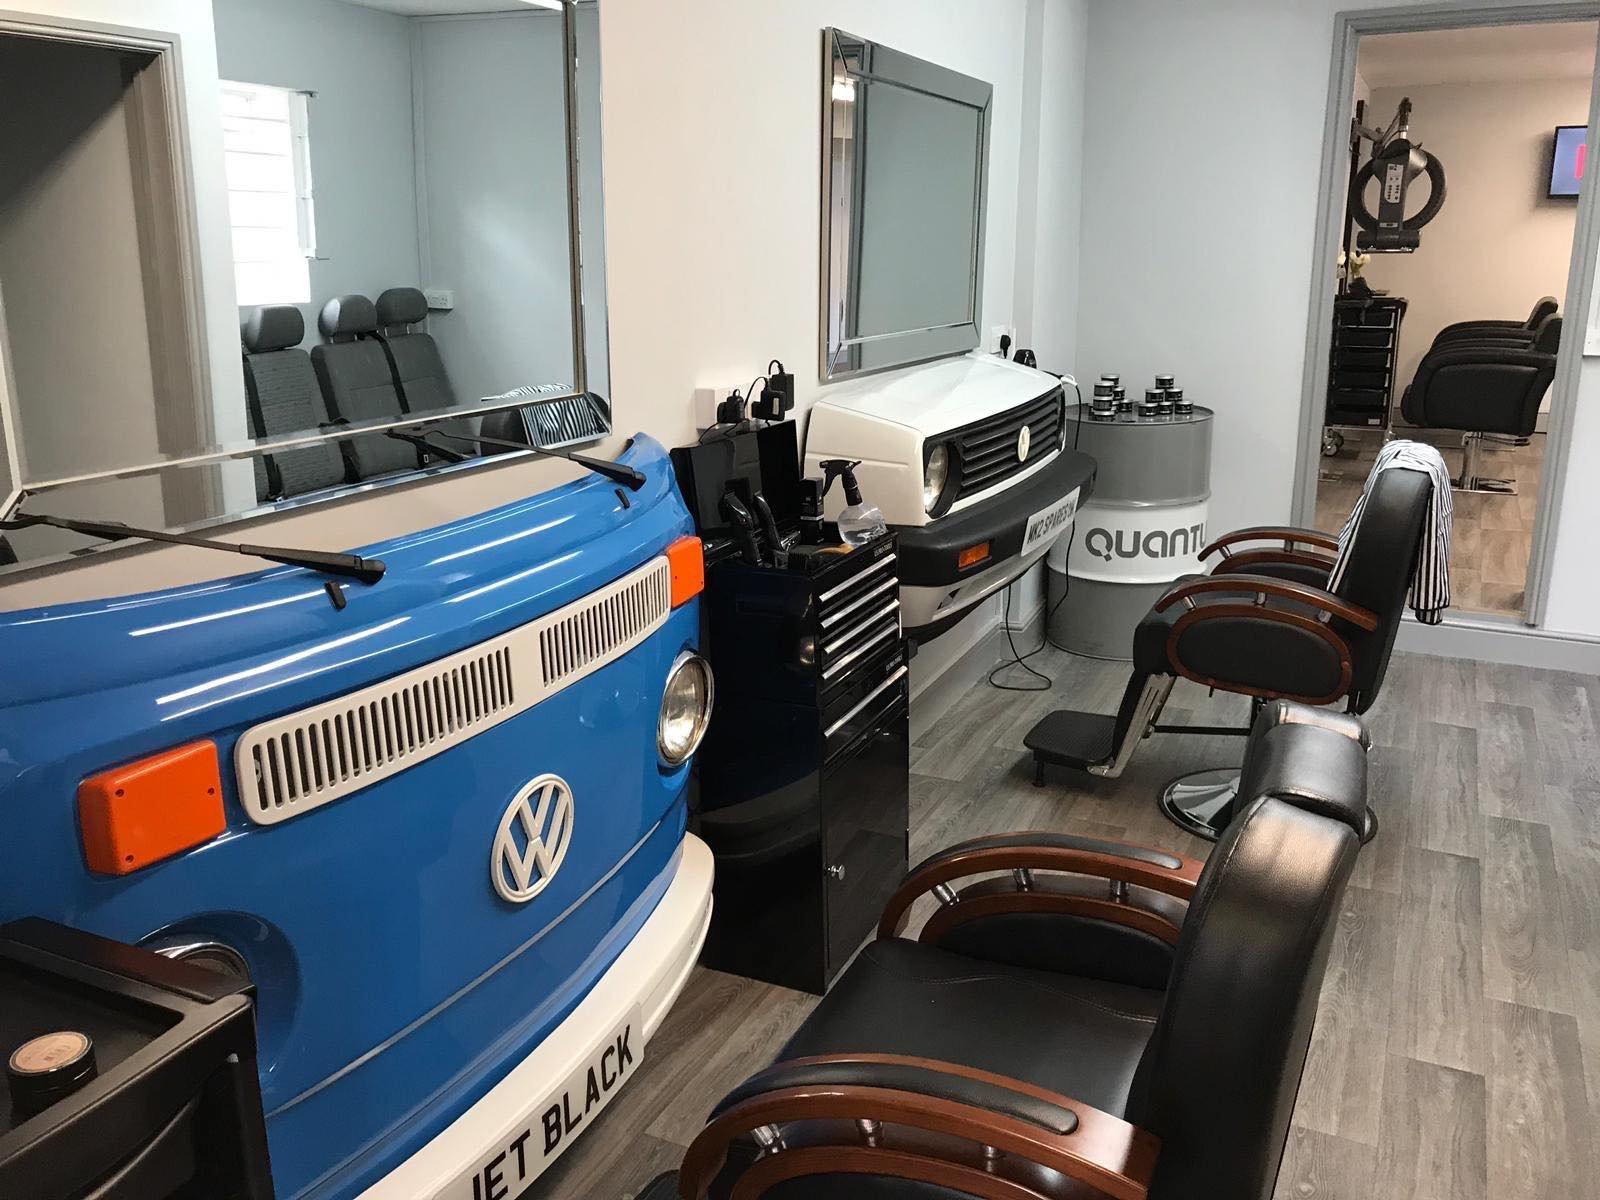 https://0201.nccdn.net/4_2/000/000/046/6ea/barbers-6-1600x1200.jpg